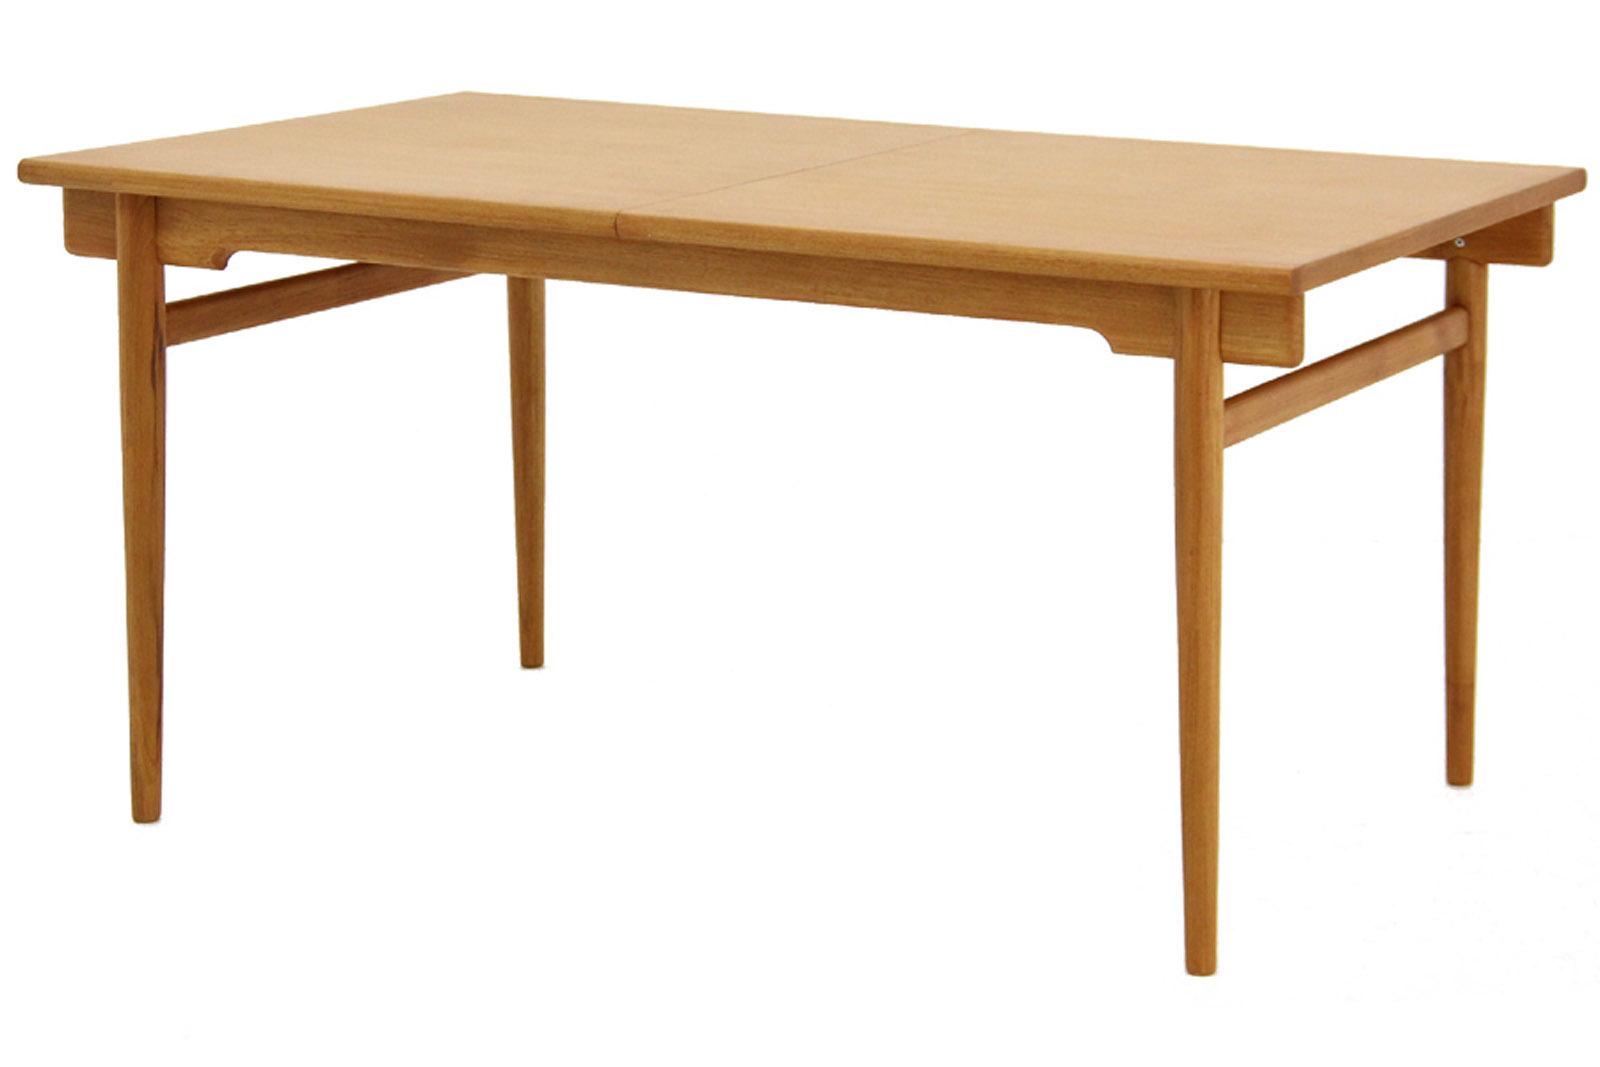 Foundation エクステンションダイニングテーブル 150cm